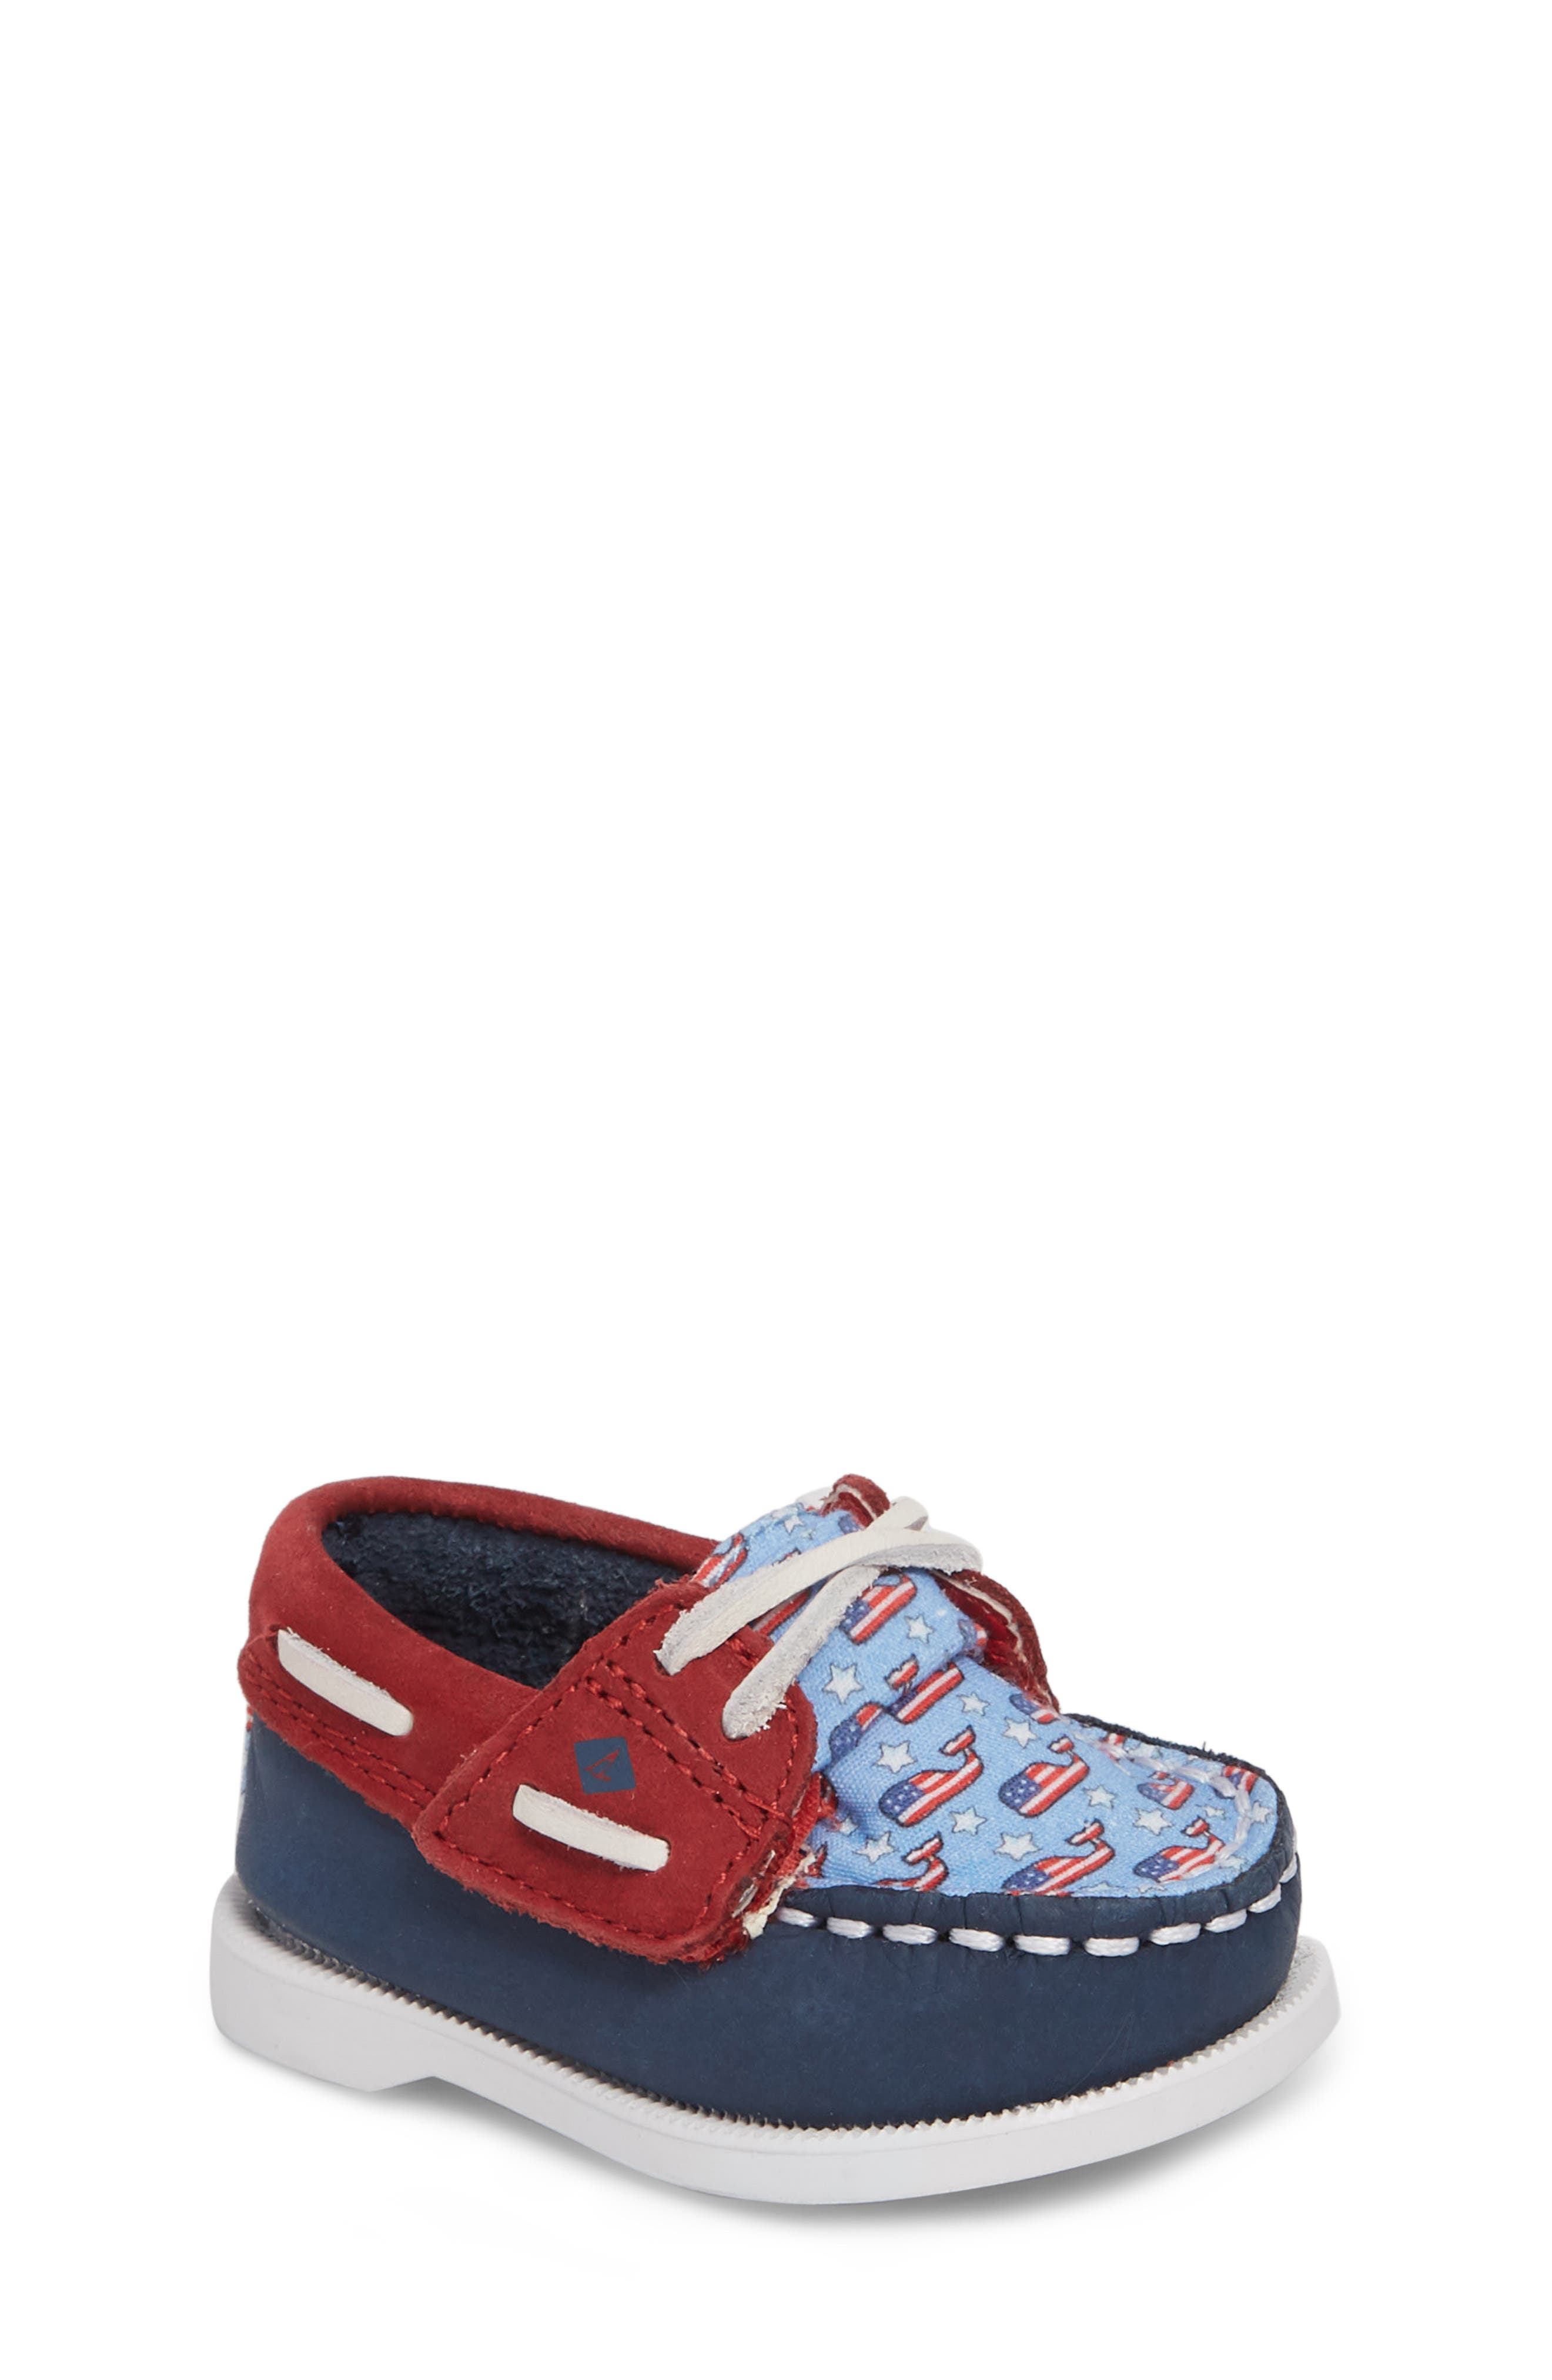 Infant Sperry Kids Authentic Original Crib Boat Shoe, Blue